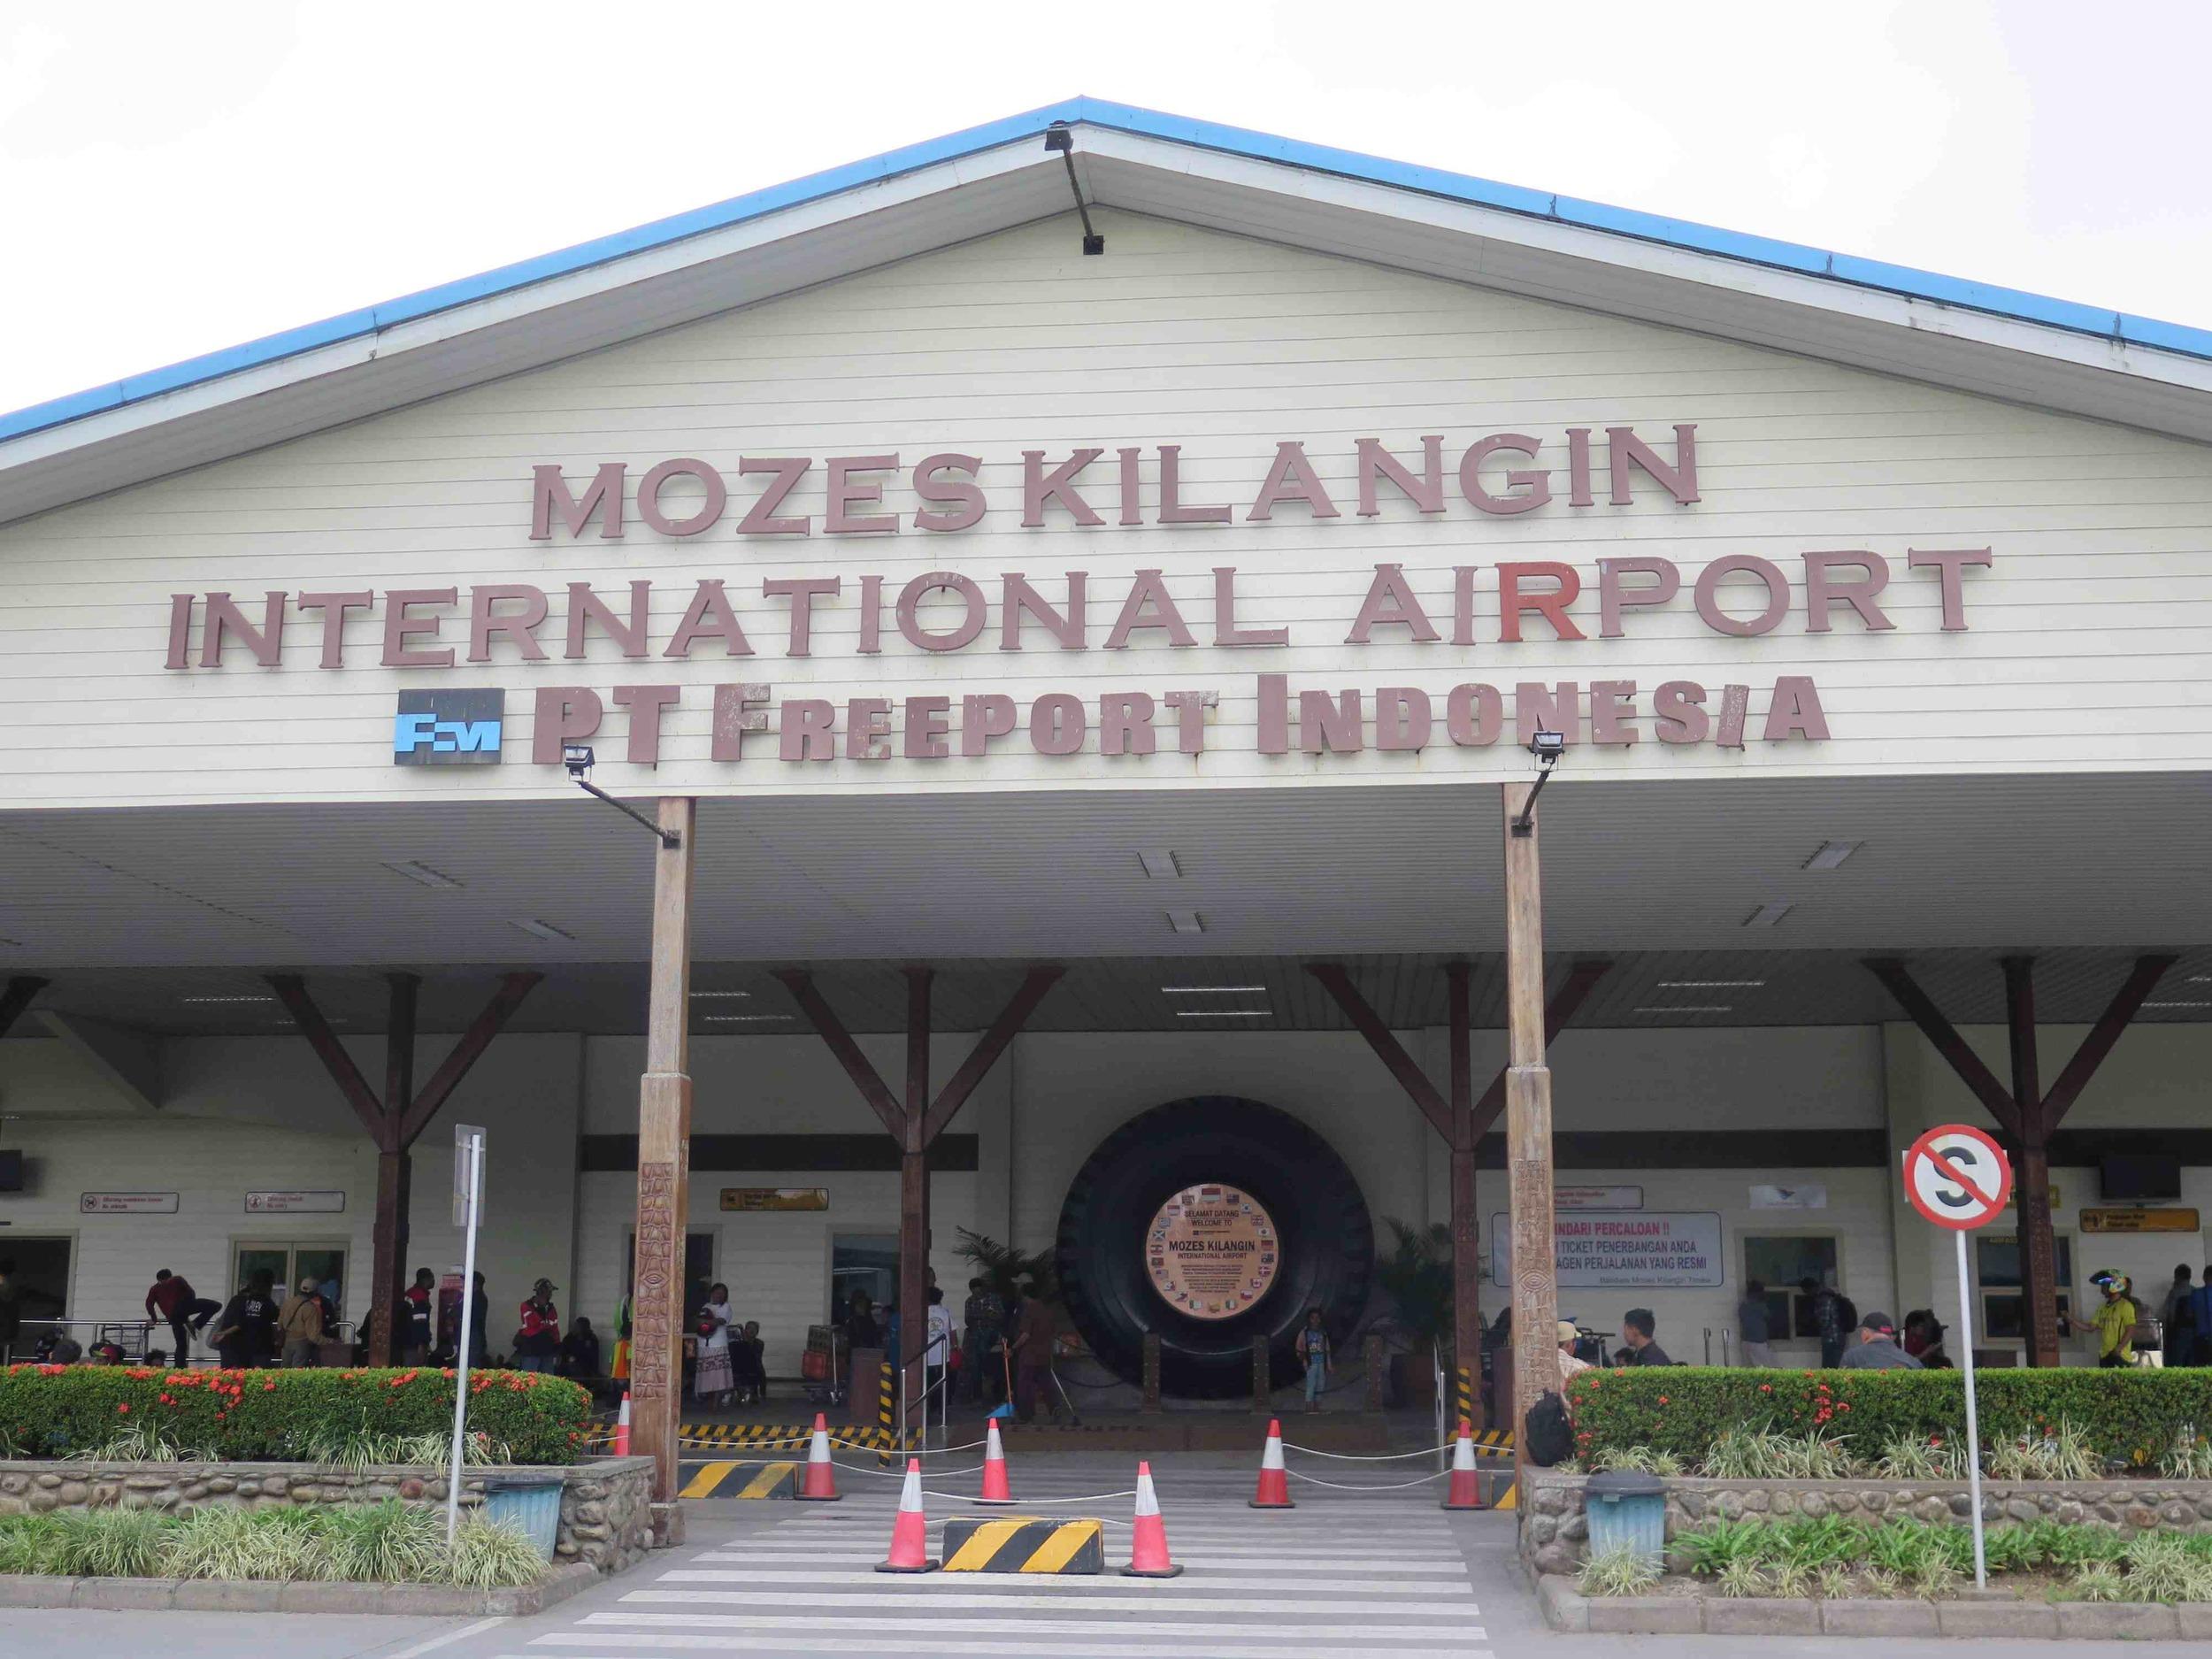 Timika havaalani girisi / Entrance to Timika airport